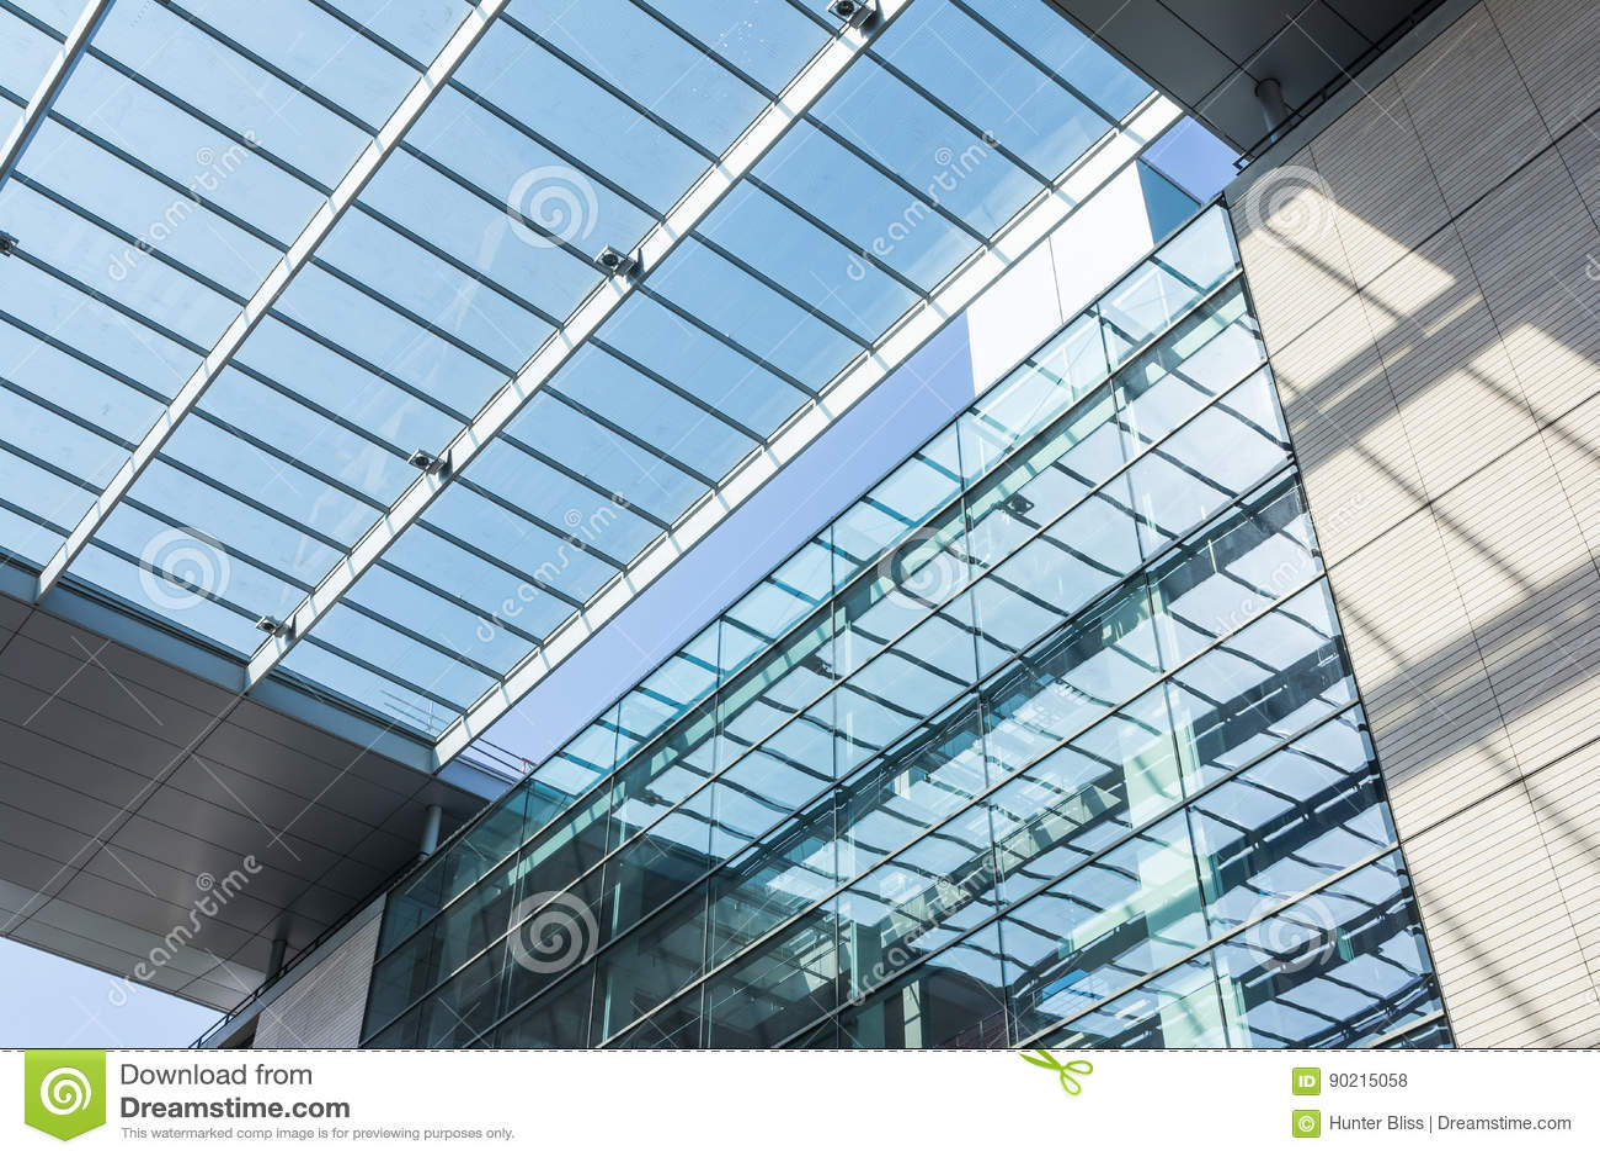 modern european geometric architecture design public